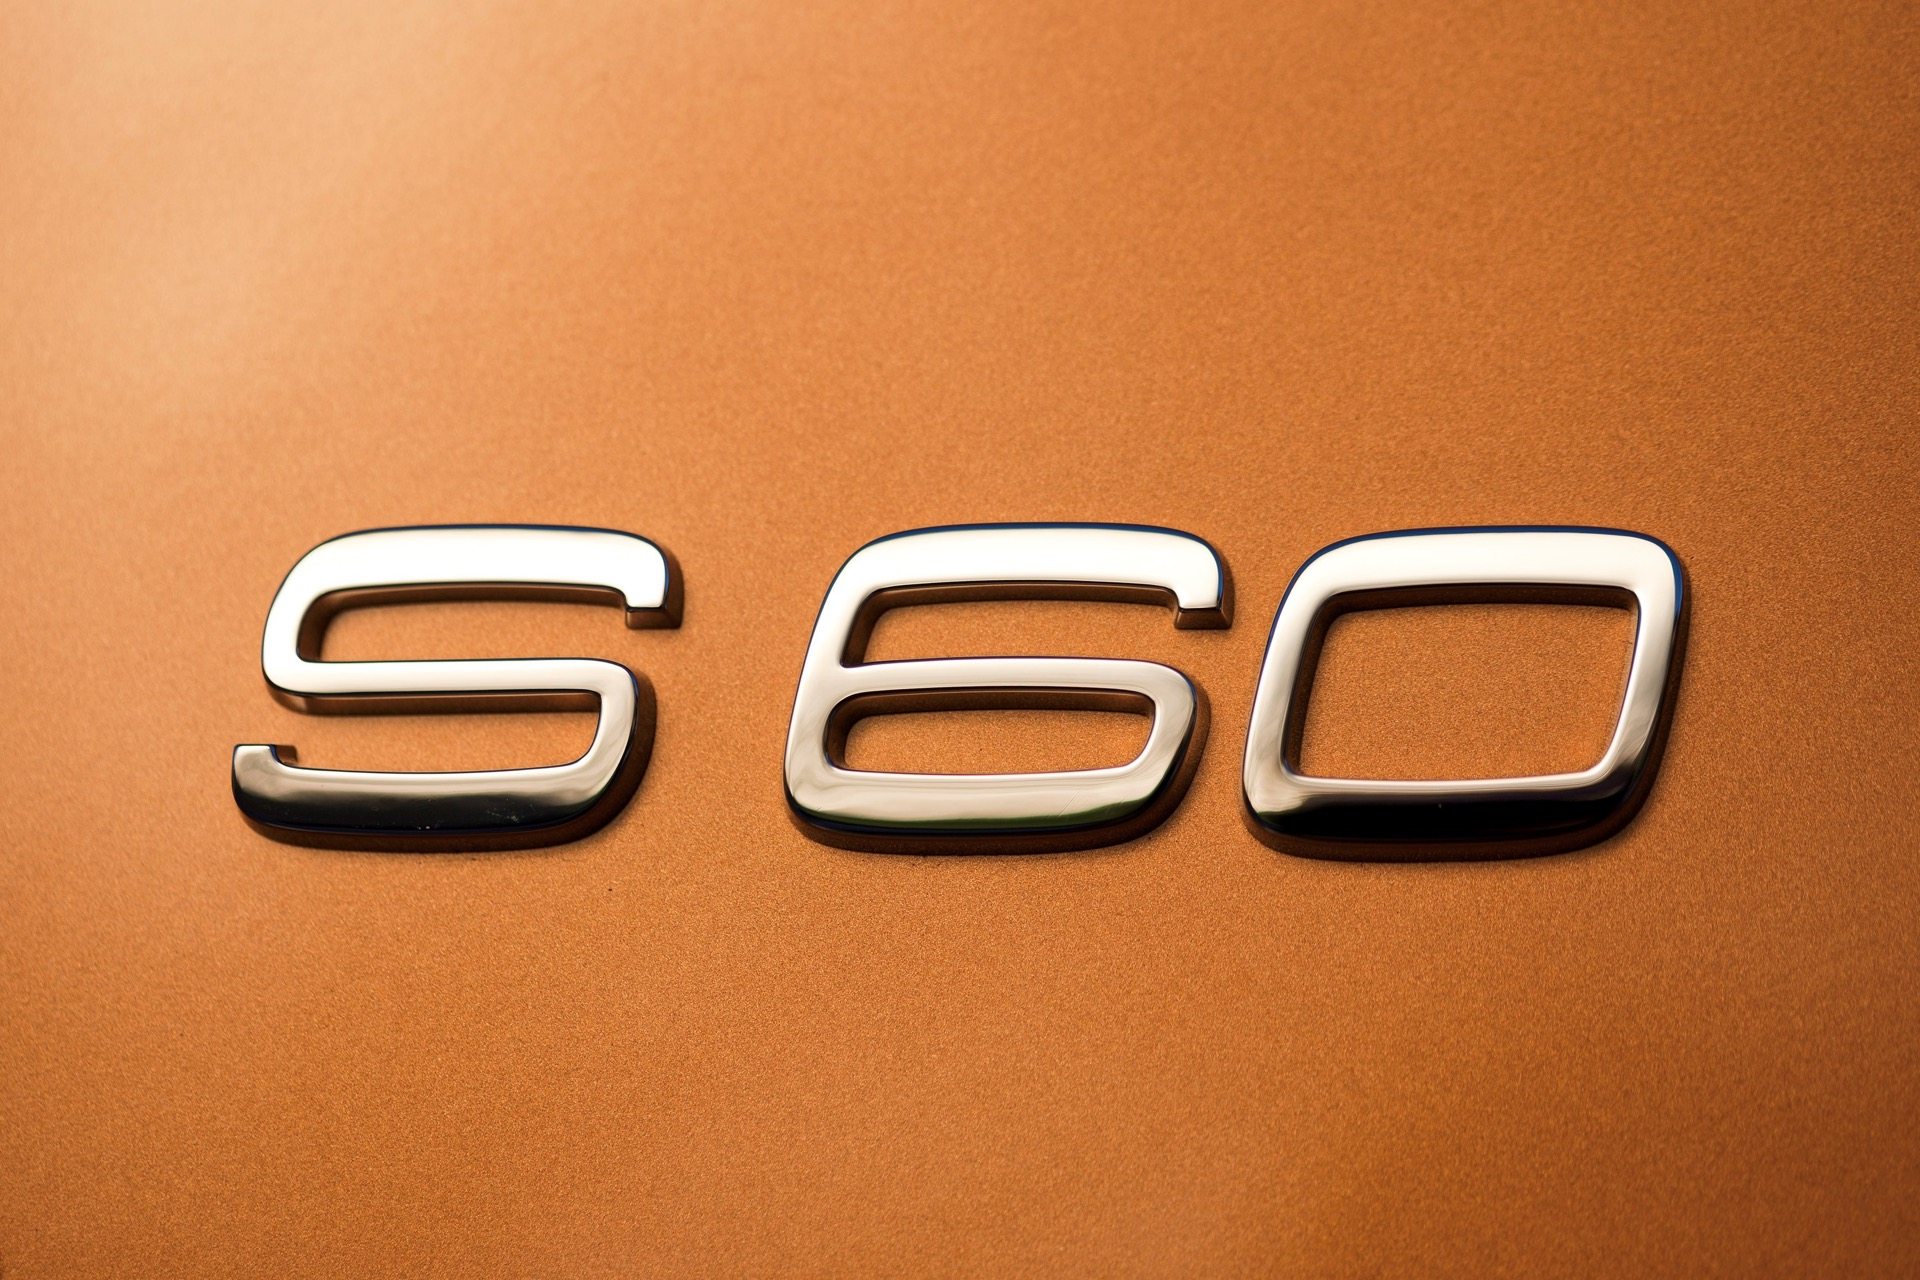 S60 T6 Awd Badge01 -  Volvo